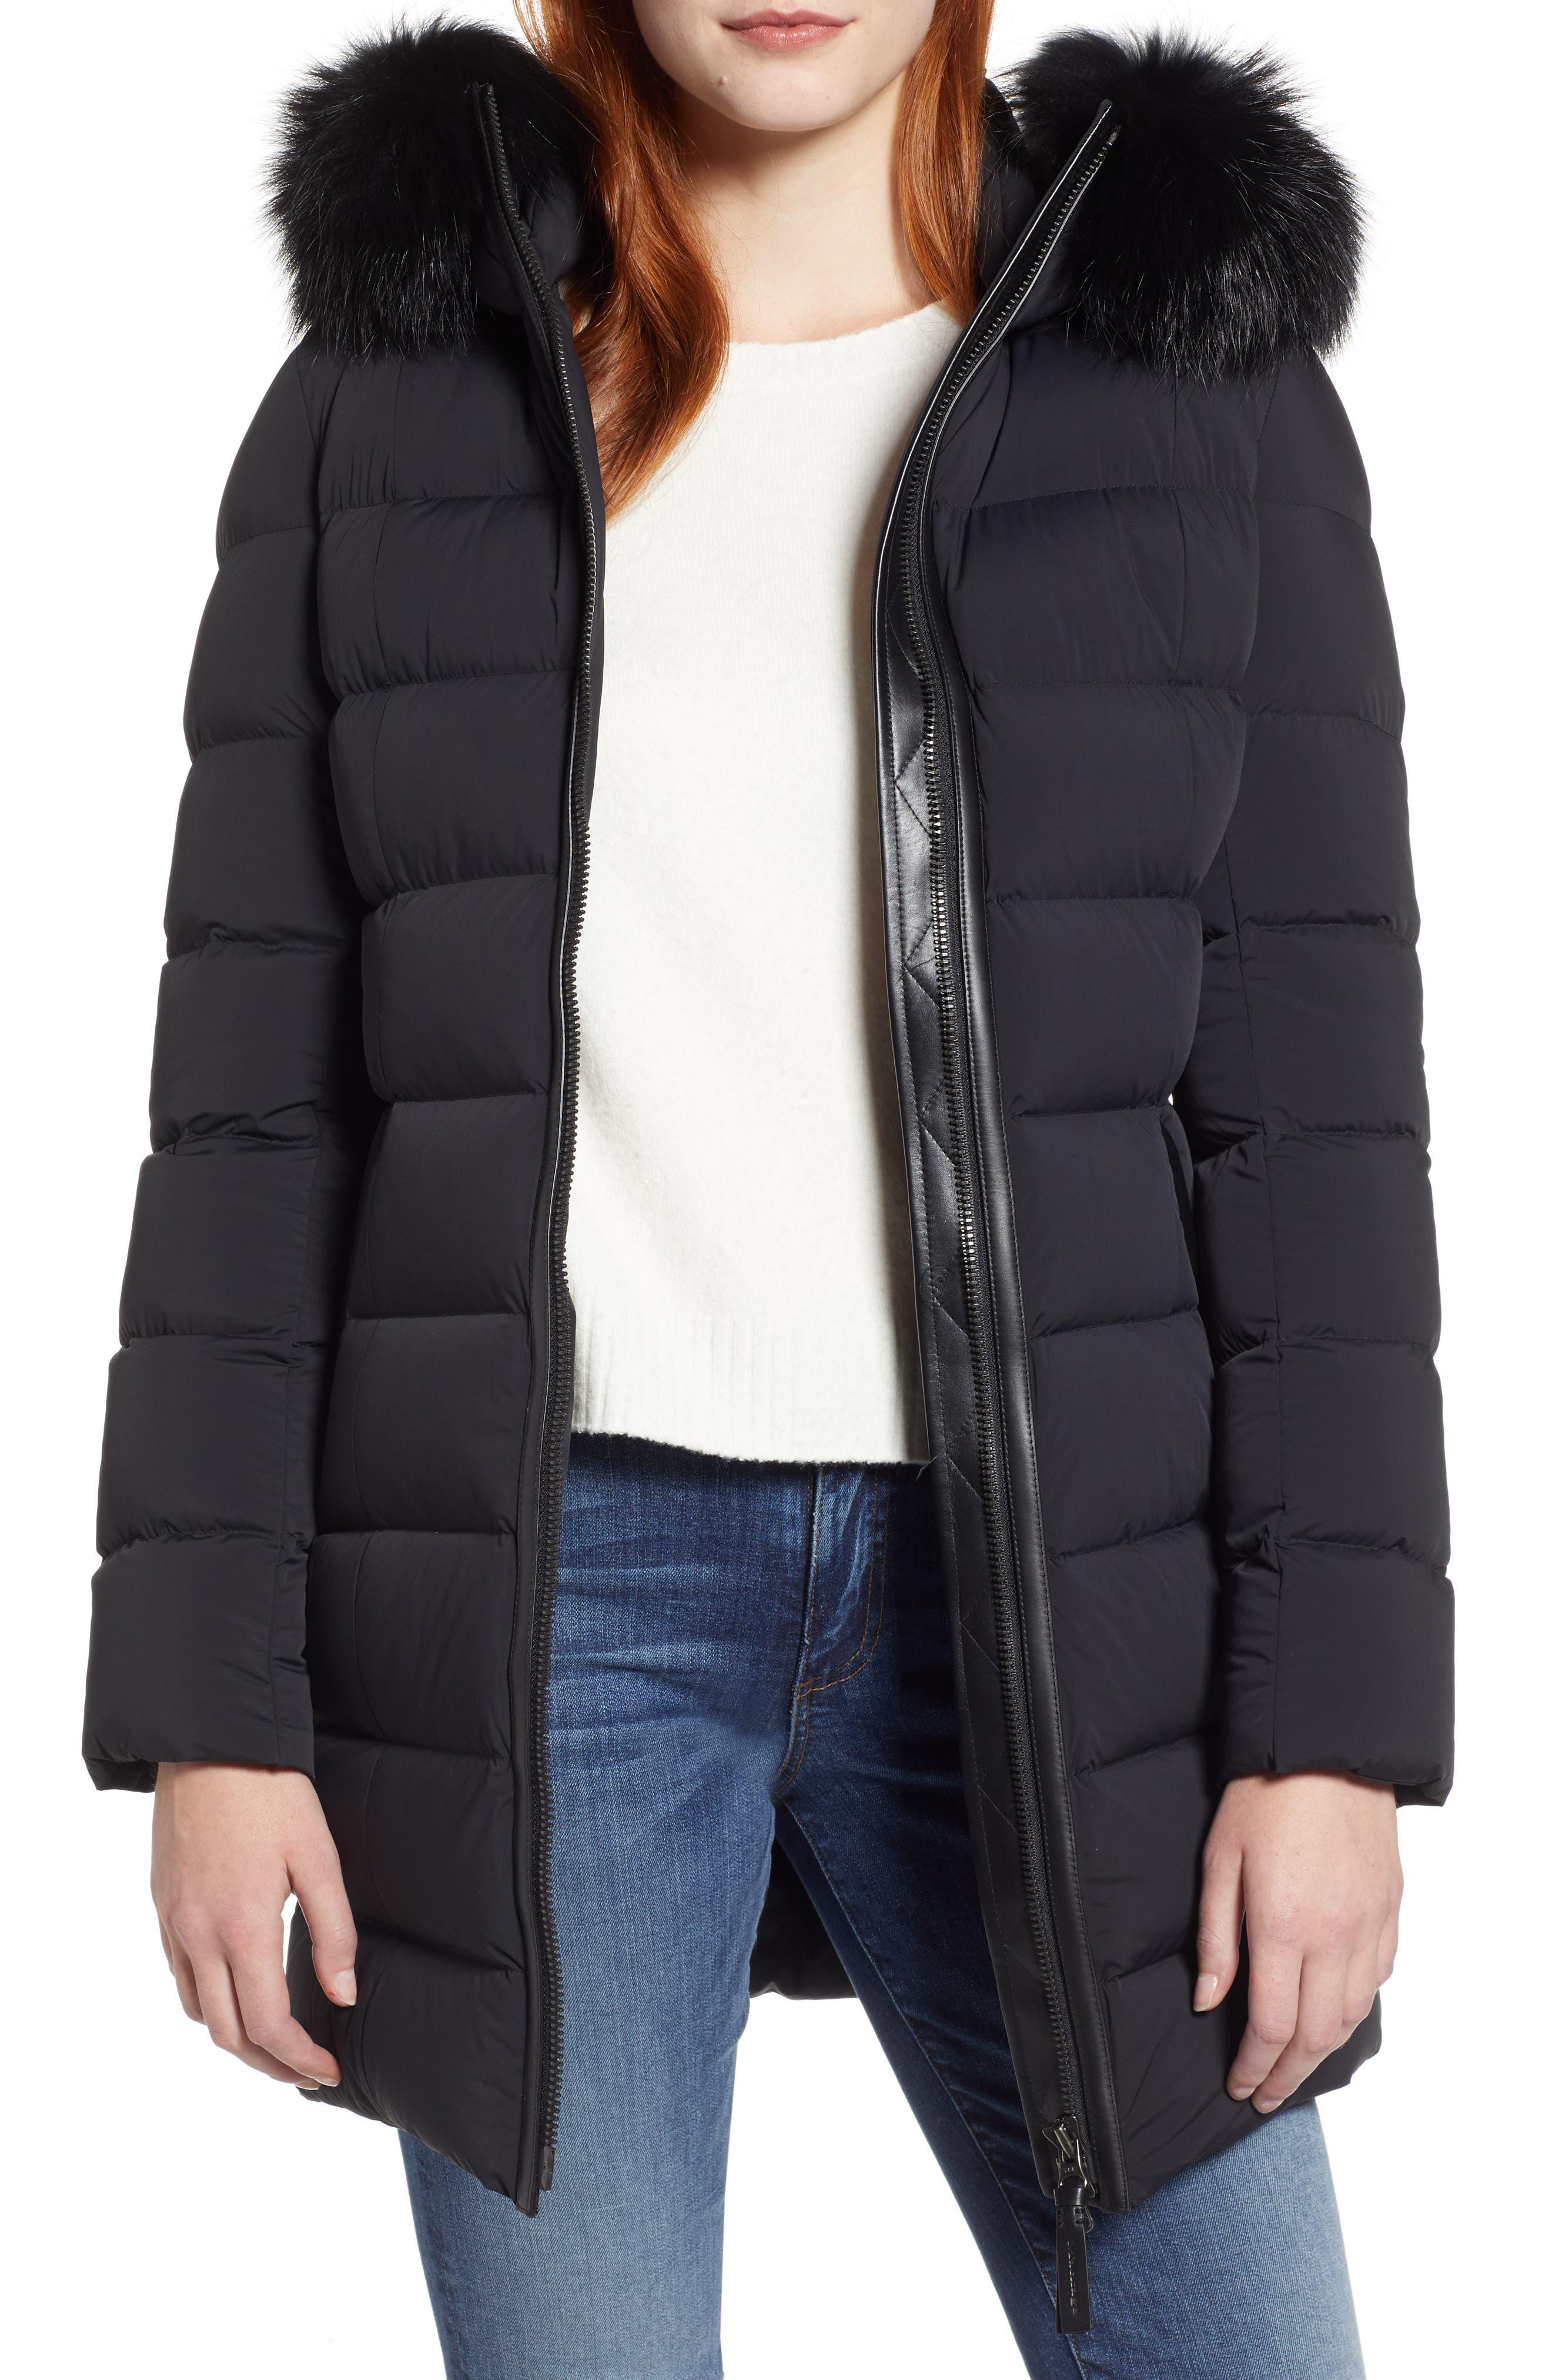 MACKAGE, Calla Genuine Fox Fur Trim Hooded Down Coat, Main thumbnail 1, color, BLACK